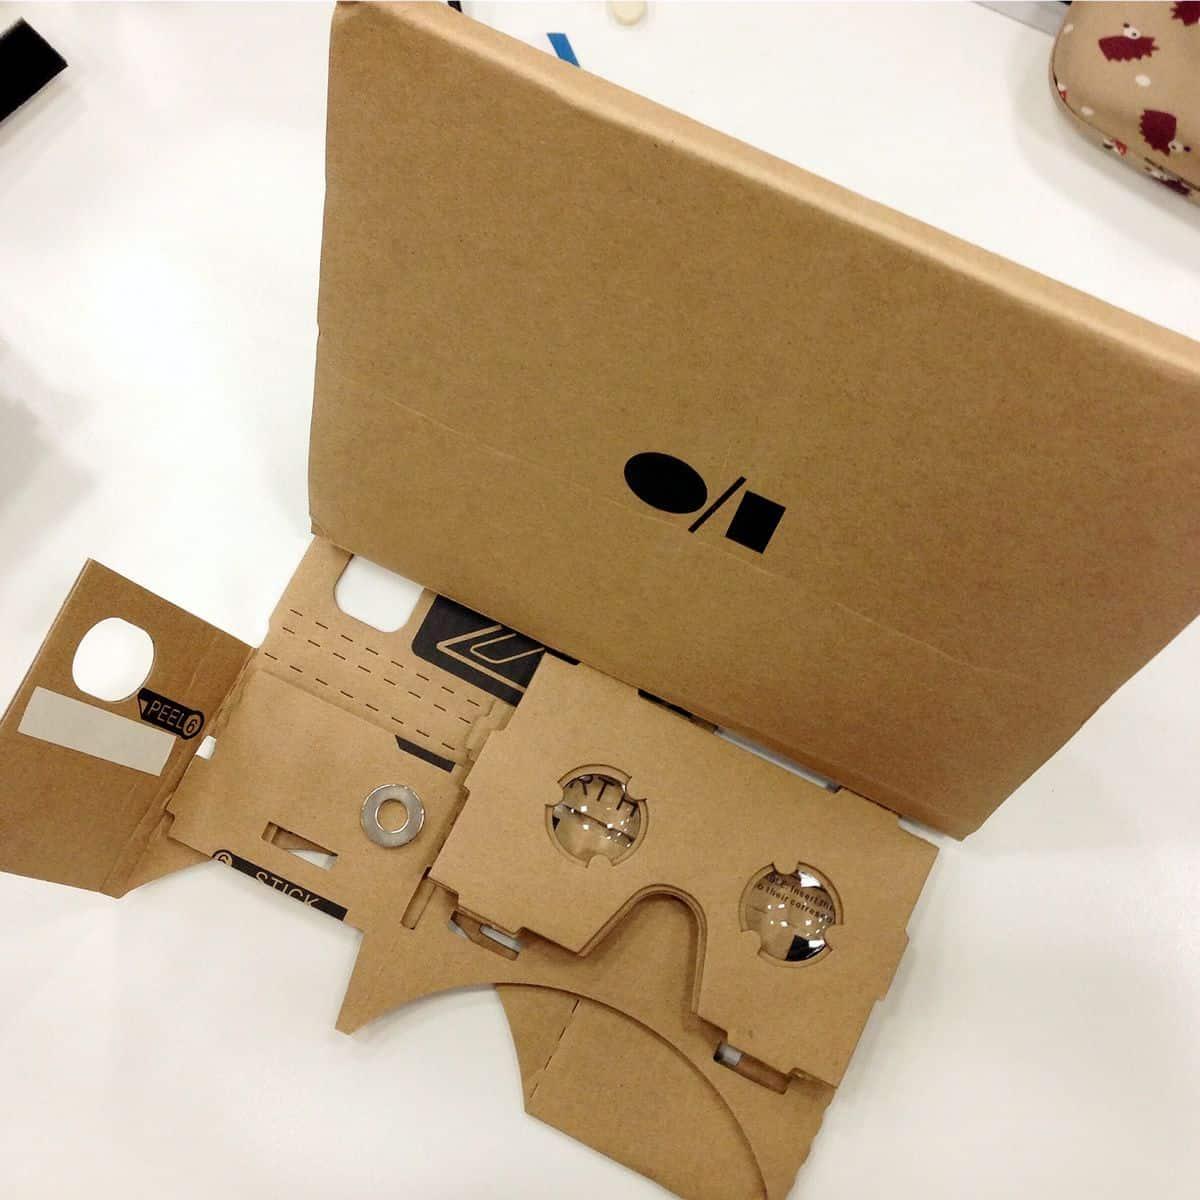 A foldable cardboard virtual reality headset.